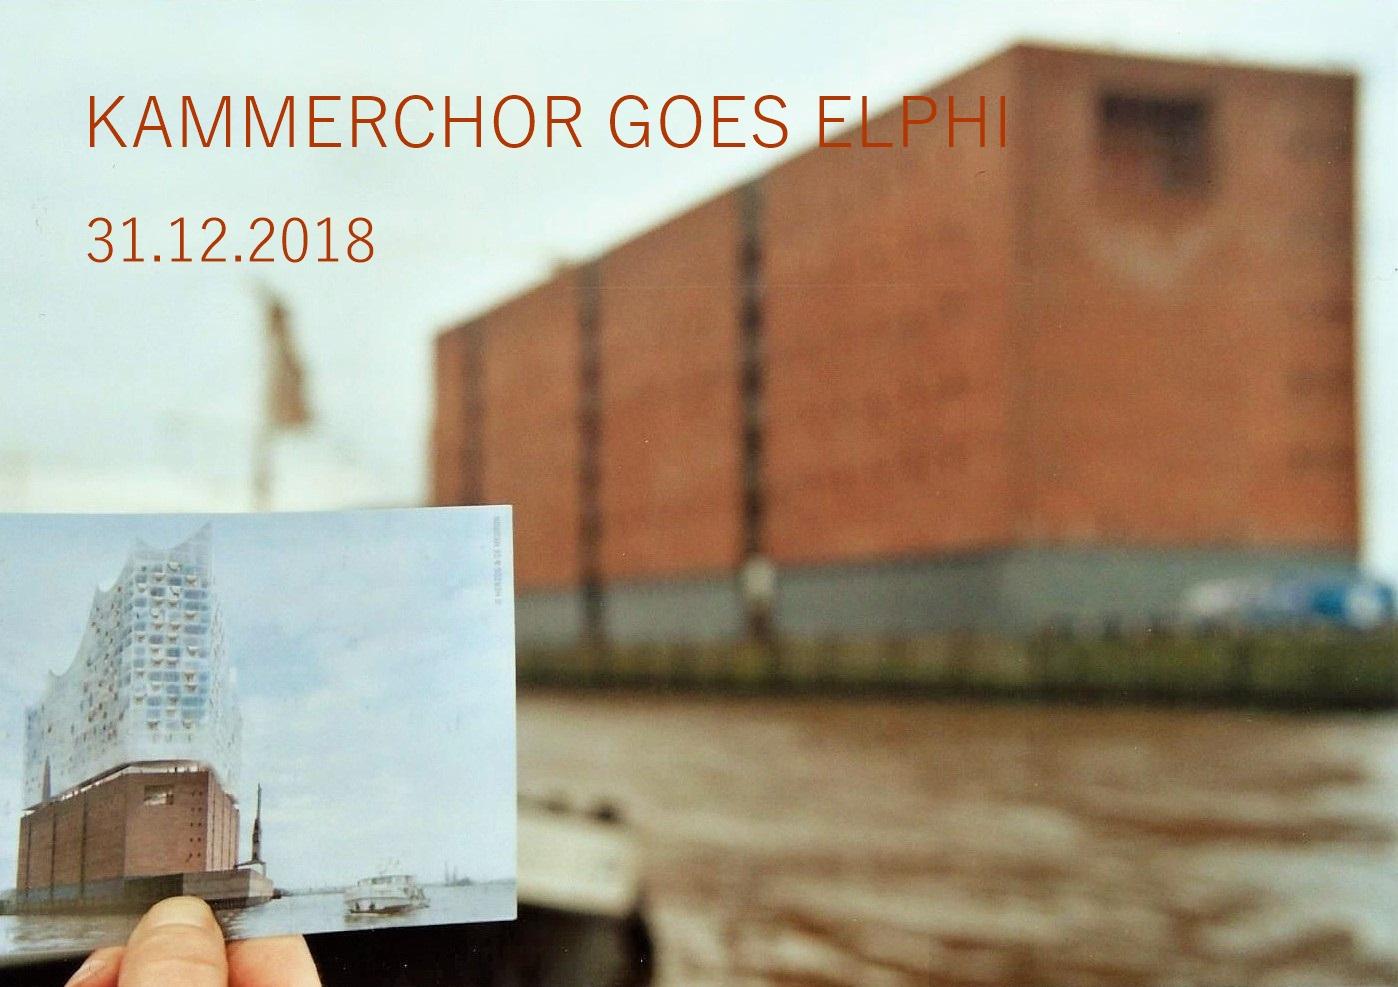 Kammerchor goes Elphi